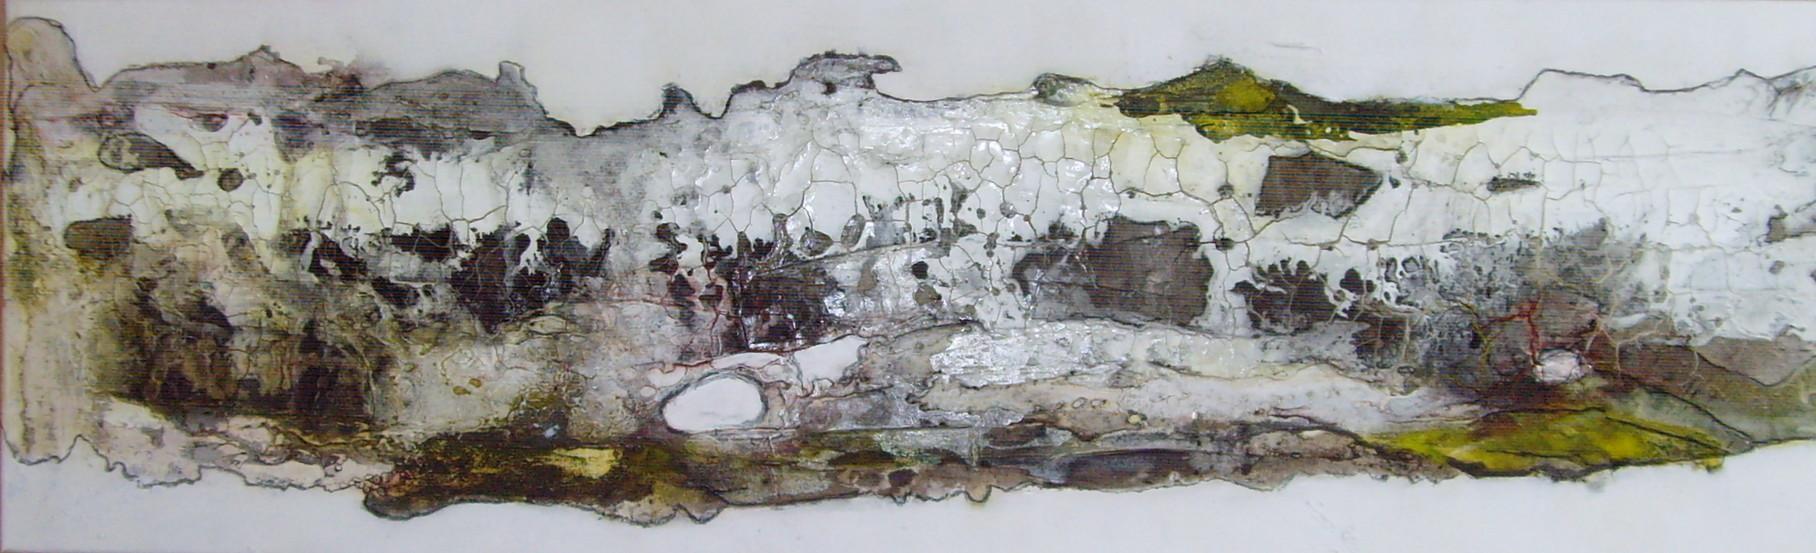 N°22 - 30cm x 1m Materialmix